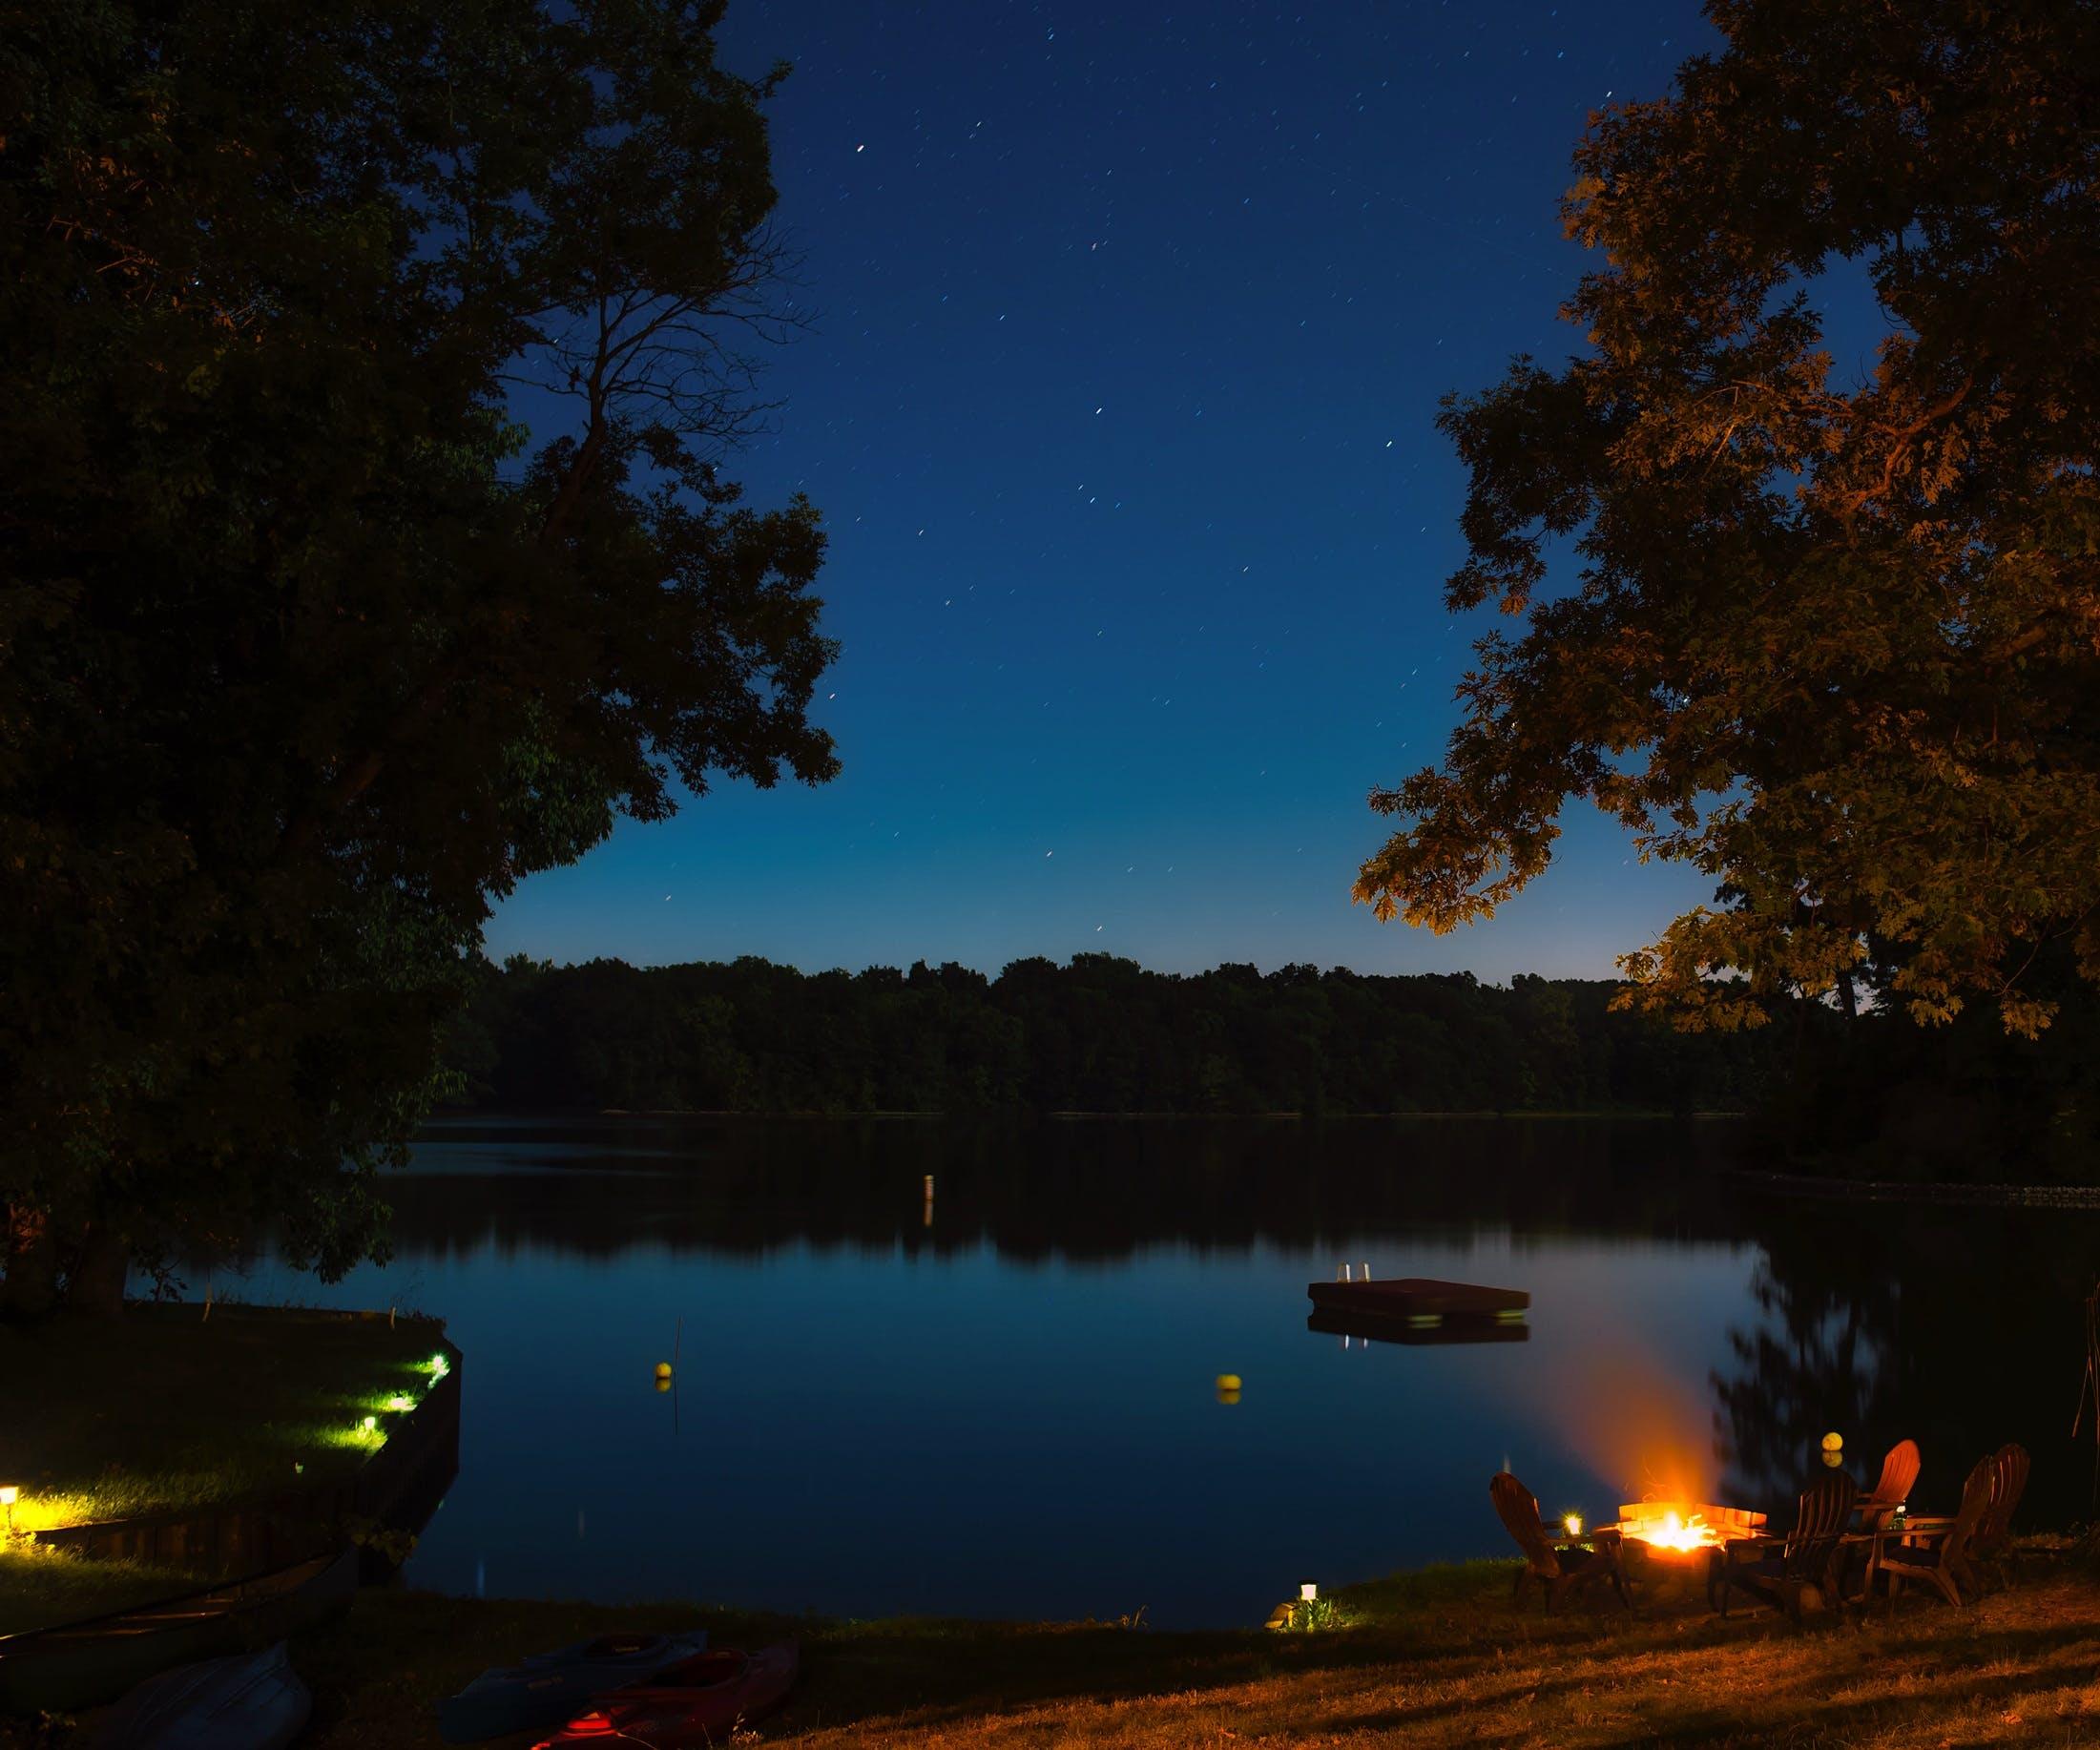 Fotos de stock gratuitas de agua, amanecer, arboles, bosque